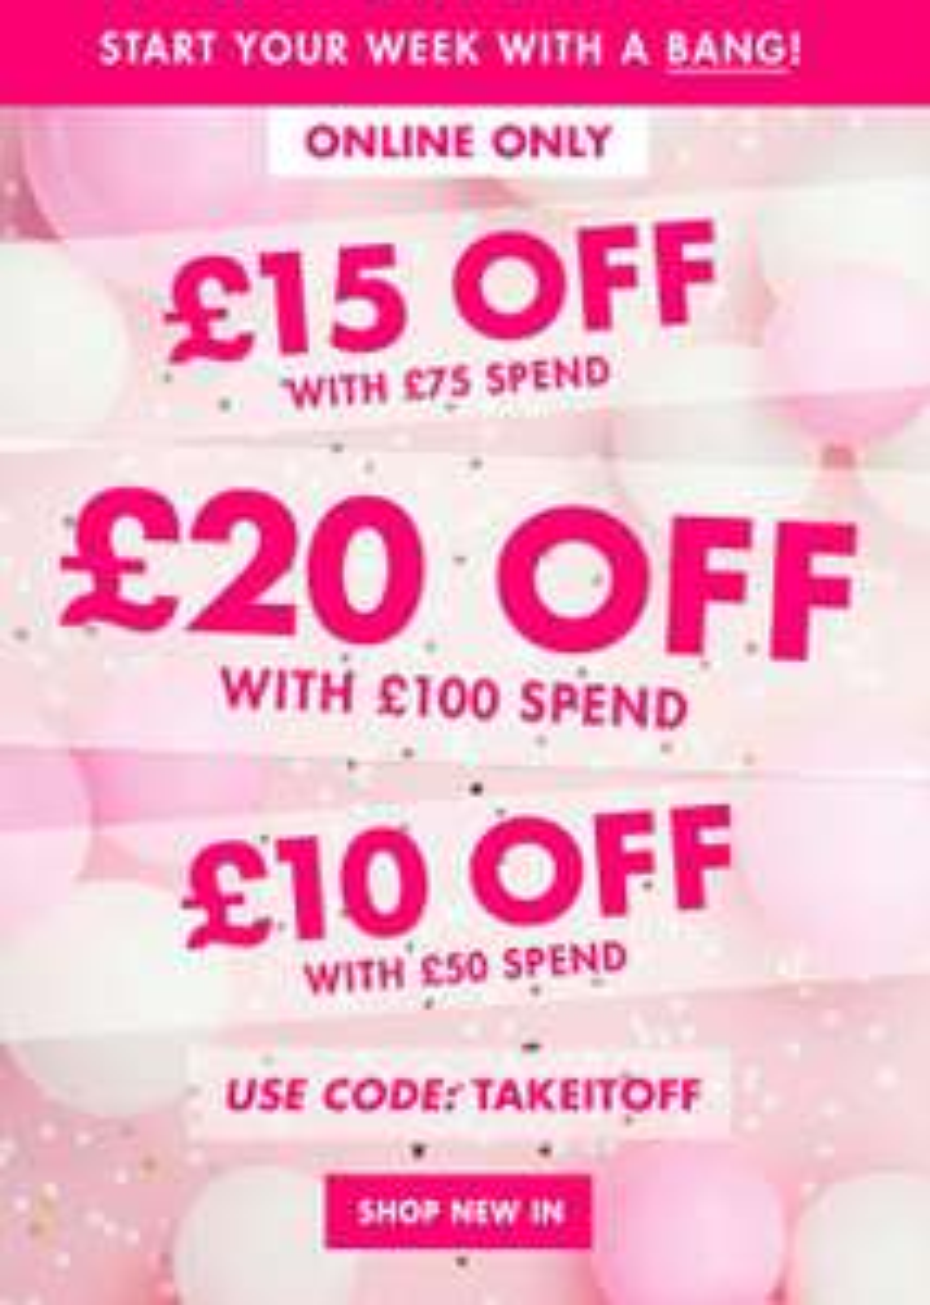 Boux Avenue Money off - £10 off £50 spend, £15 off £75 spend, £20 off £100 spend